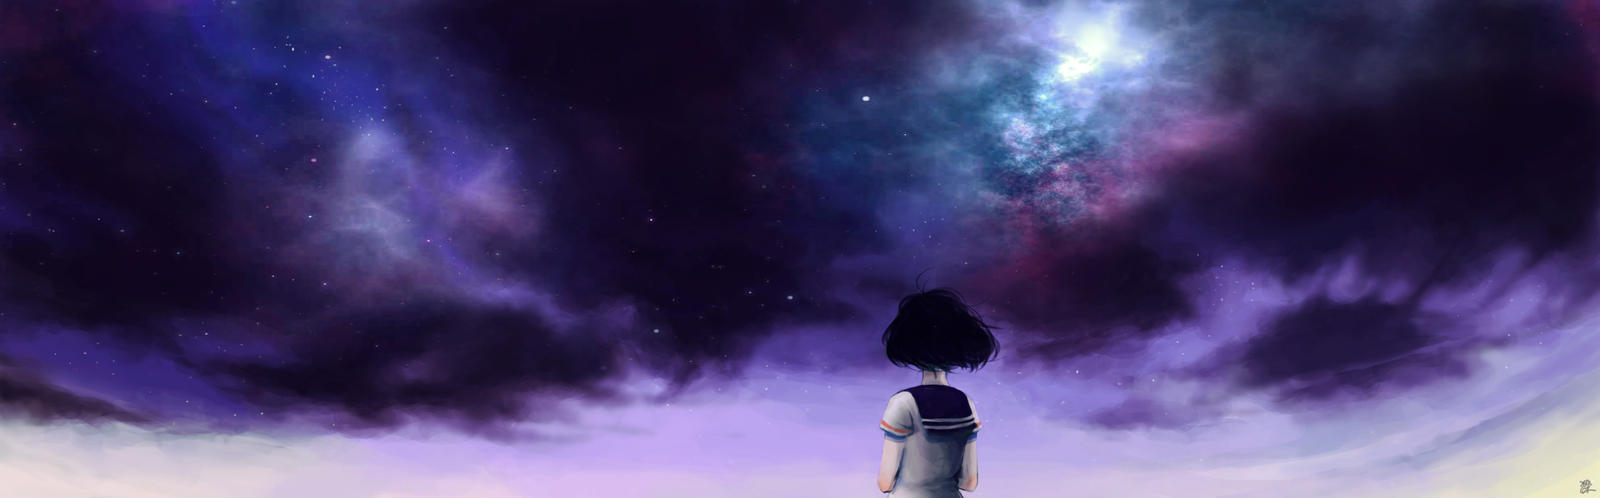 star river by iHateBubble-Tea